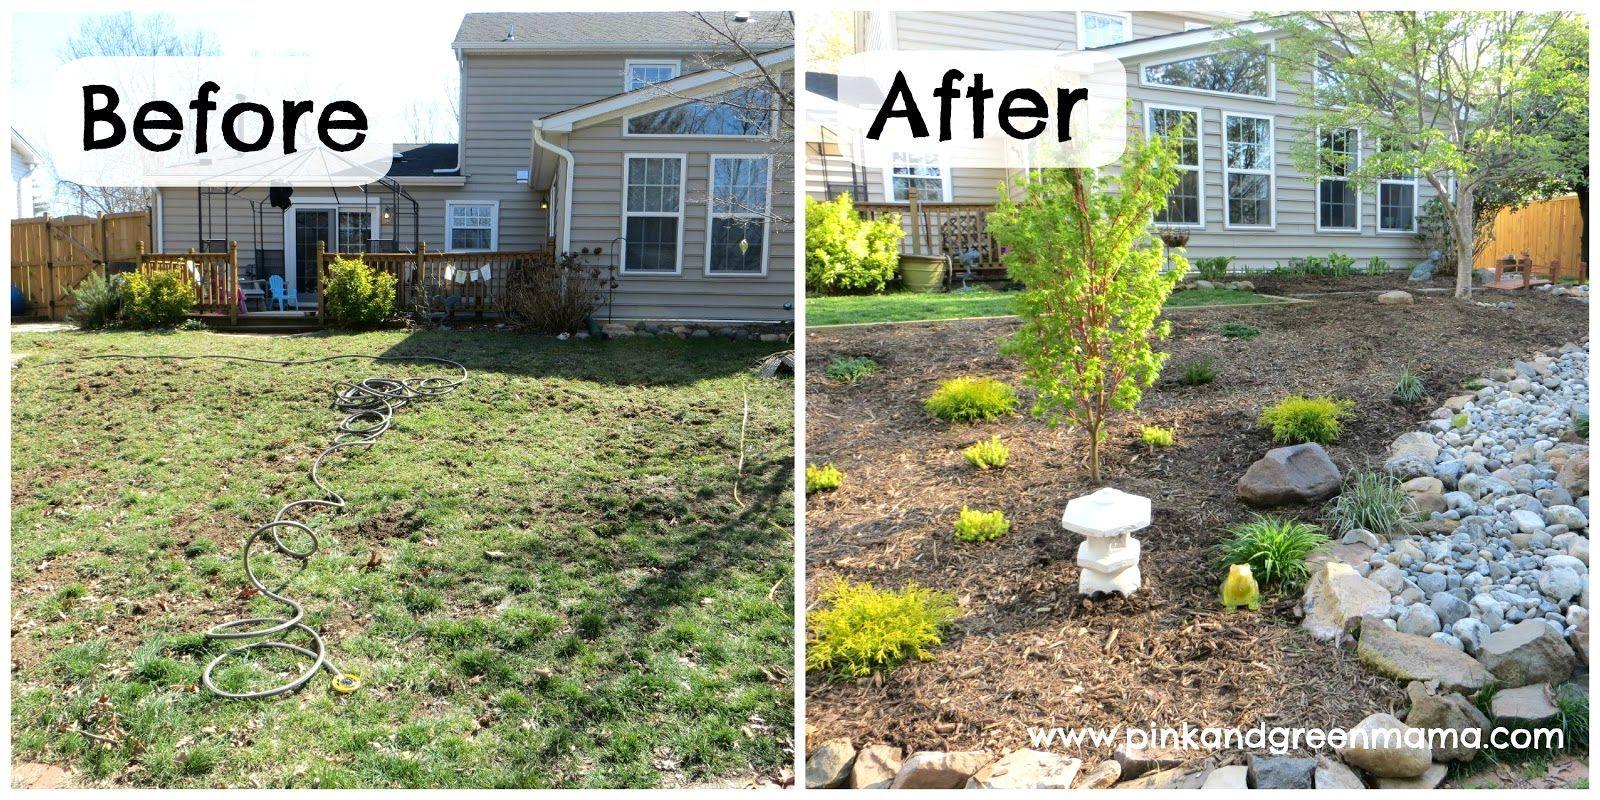 Landscape Ideas For Backyard Makeovers Backyard Makeover Small Backyard Landscaping Diy Backyard Landscaping